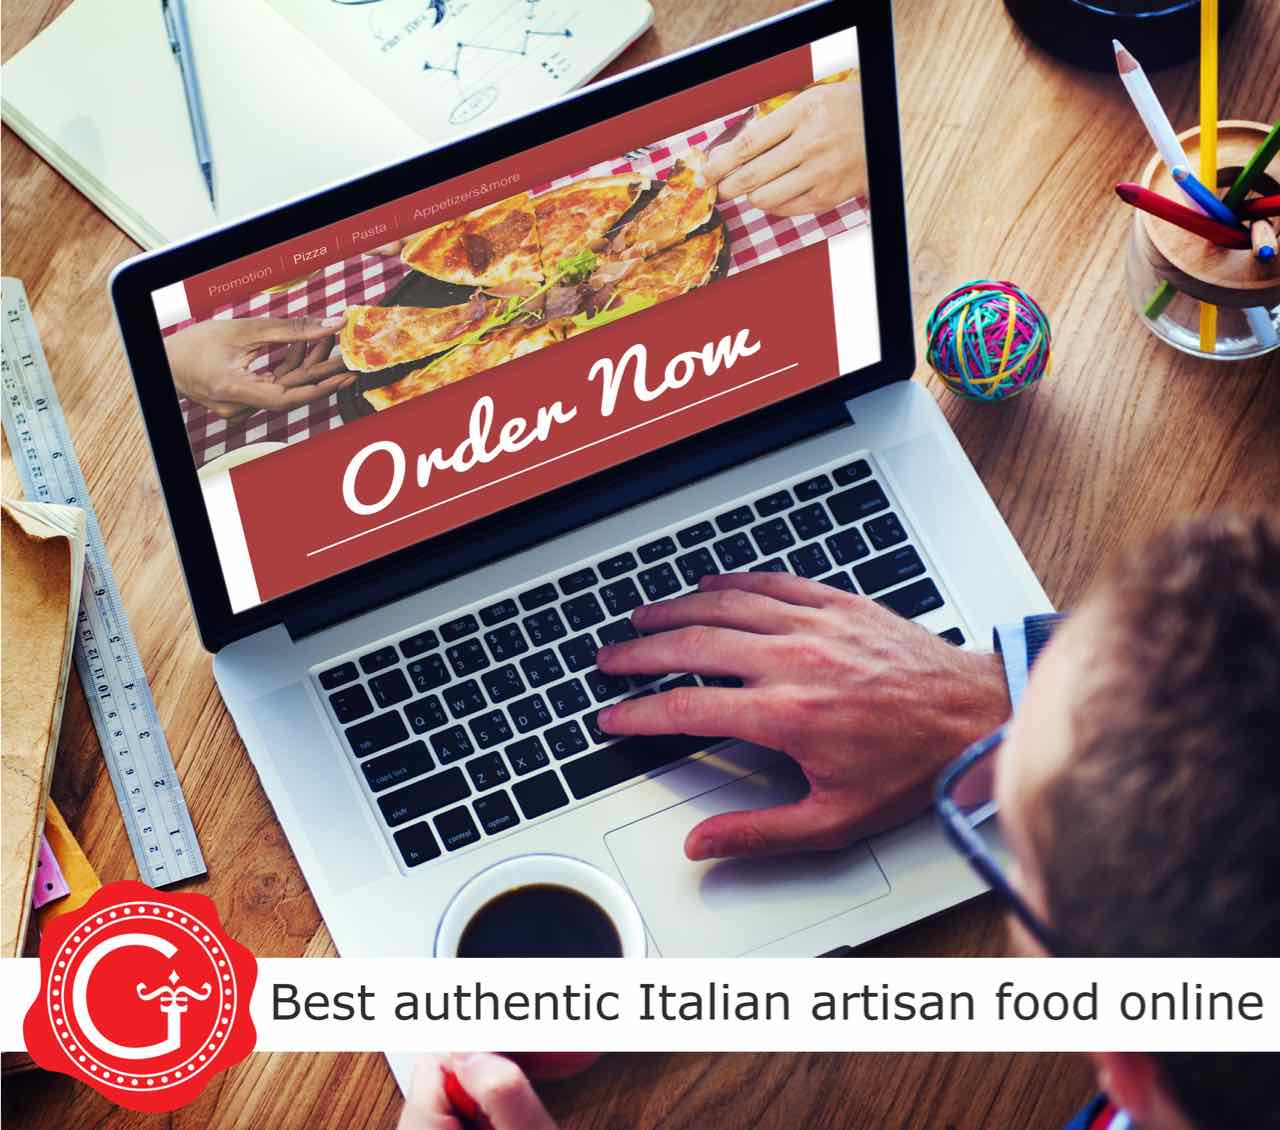 order good food online - Gustorotondo.it - Gustorotondo online shop - acquista online i migliori cibi artigianali - best authentic Italian artisan food online